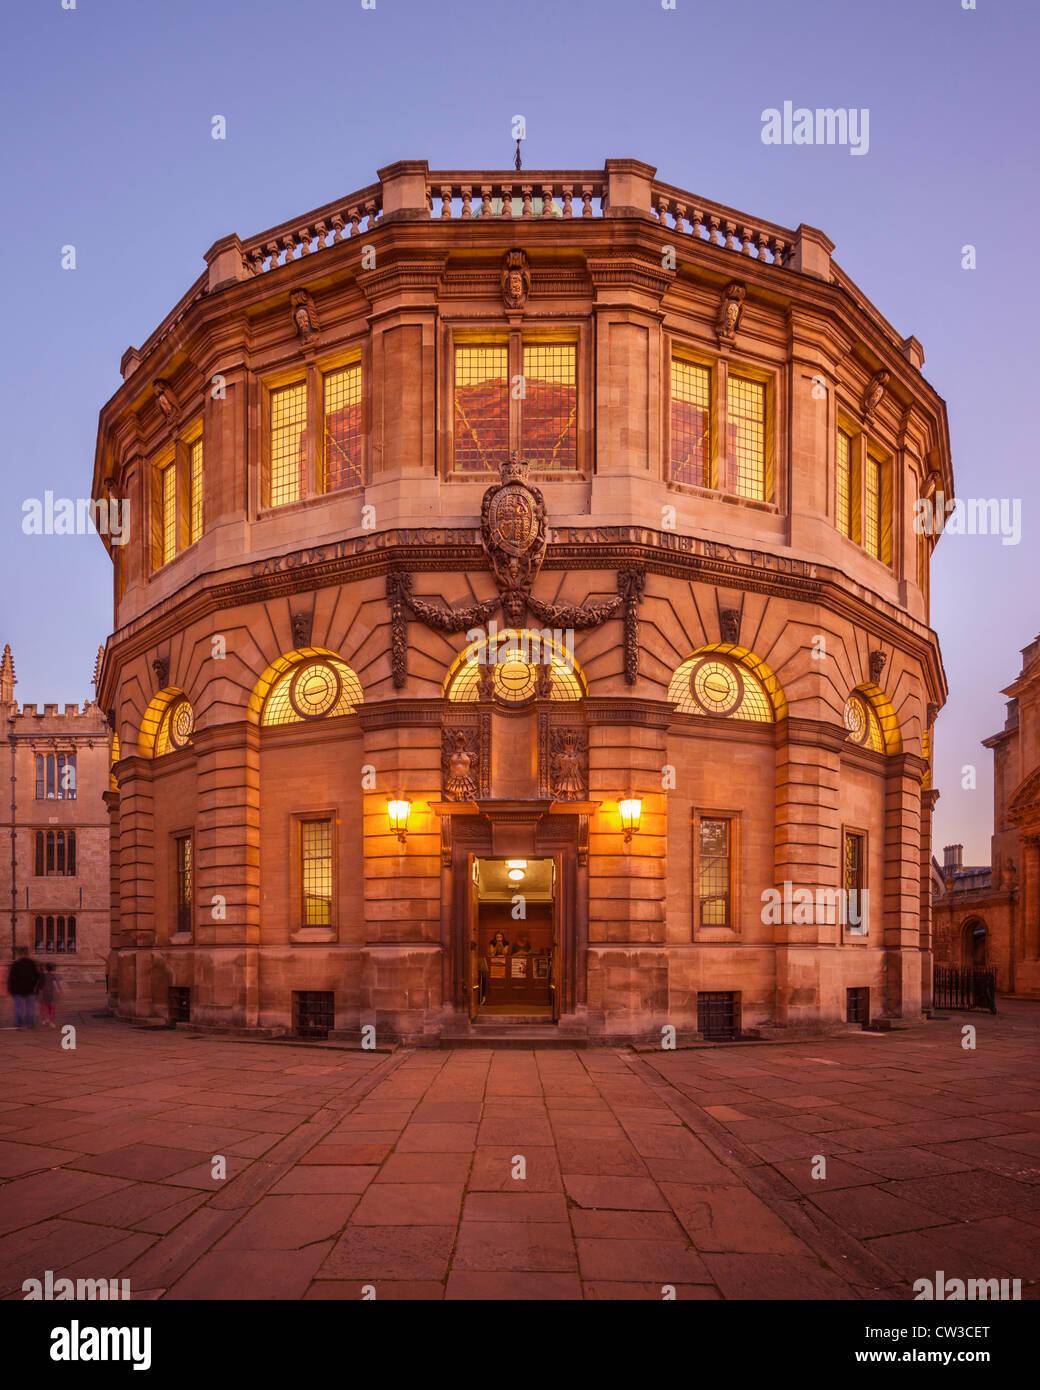 Sheldonian Theatre, Oxford Stock Photo